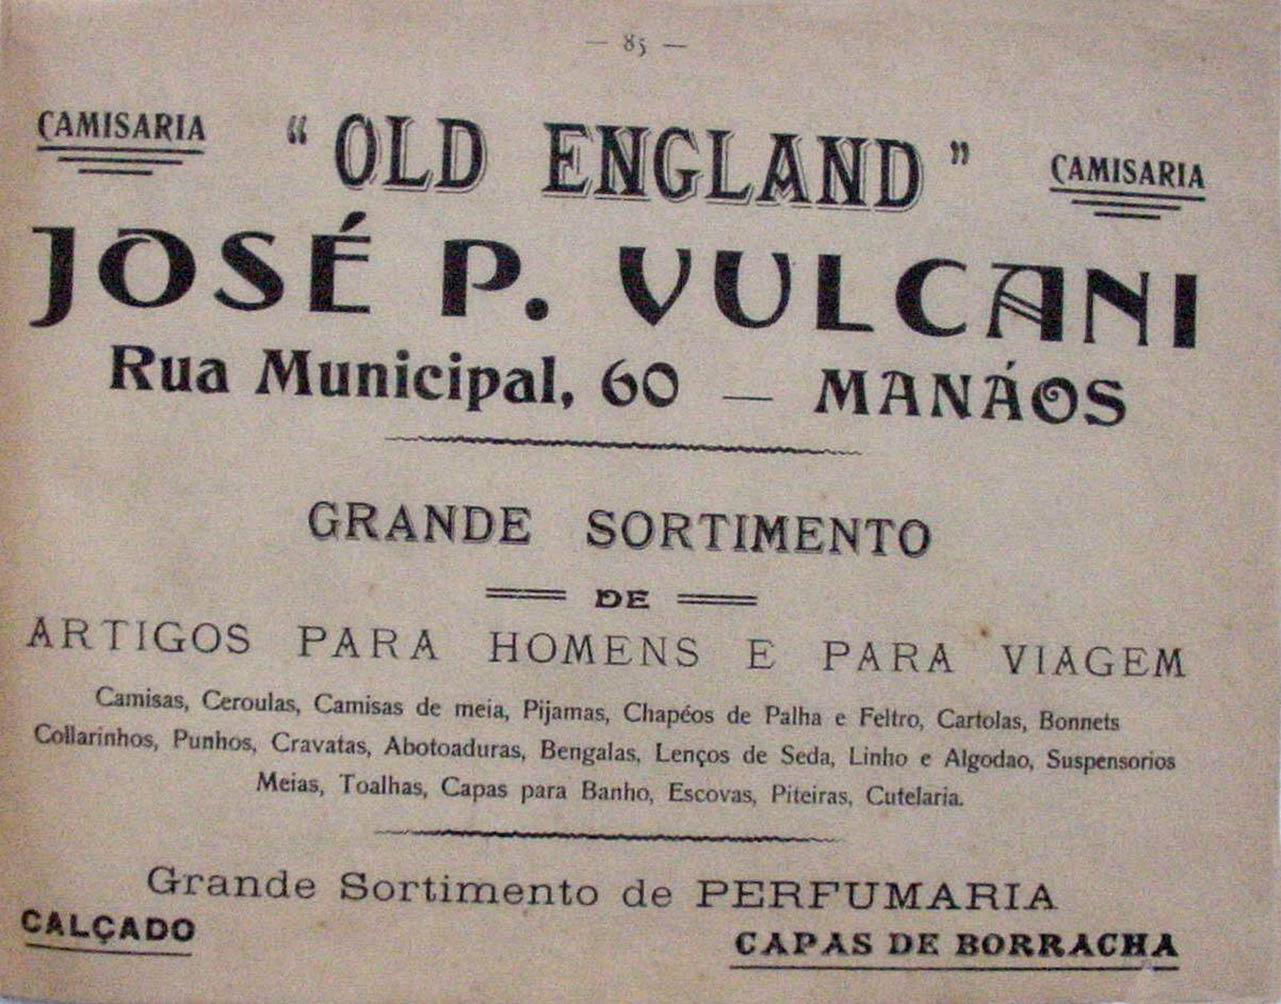 Propaganda da Camisaria Old England